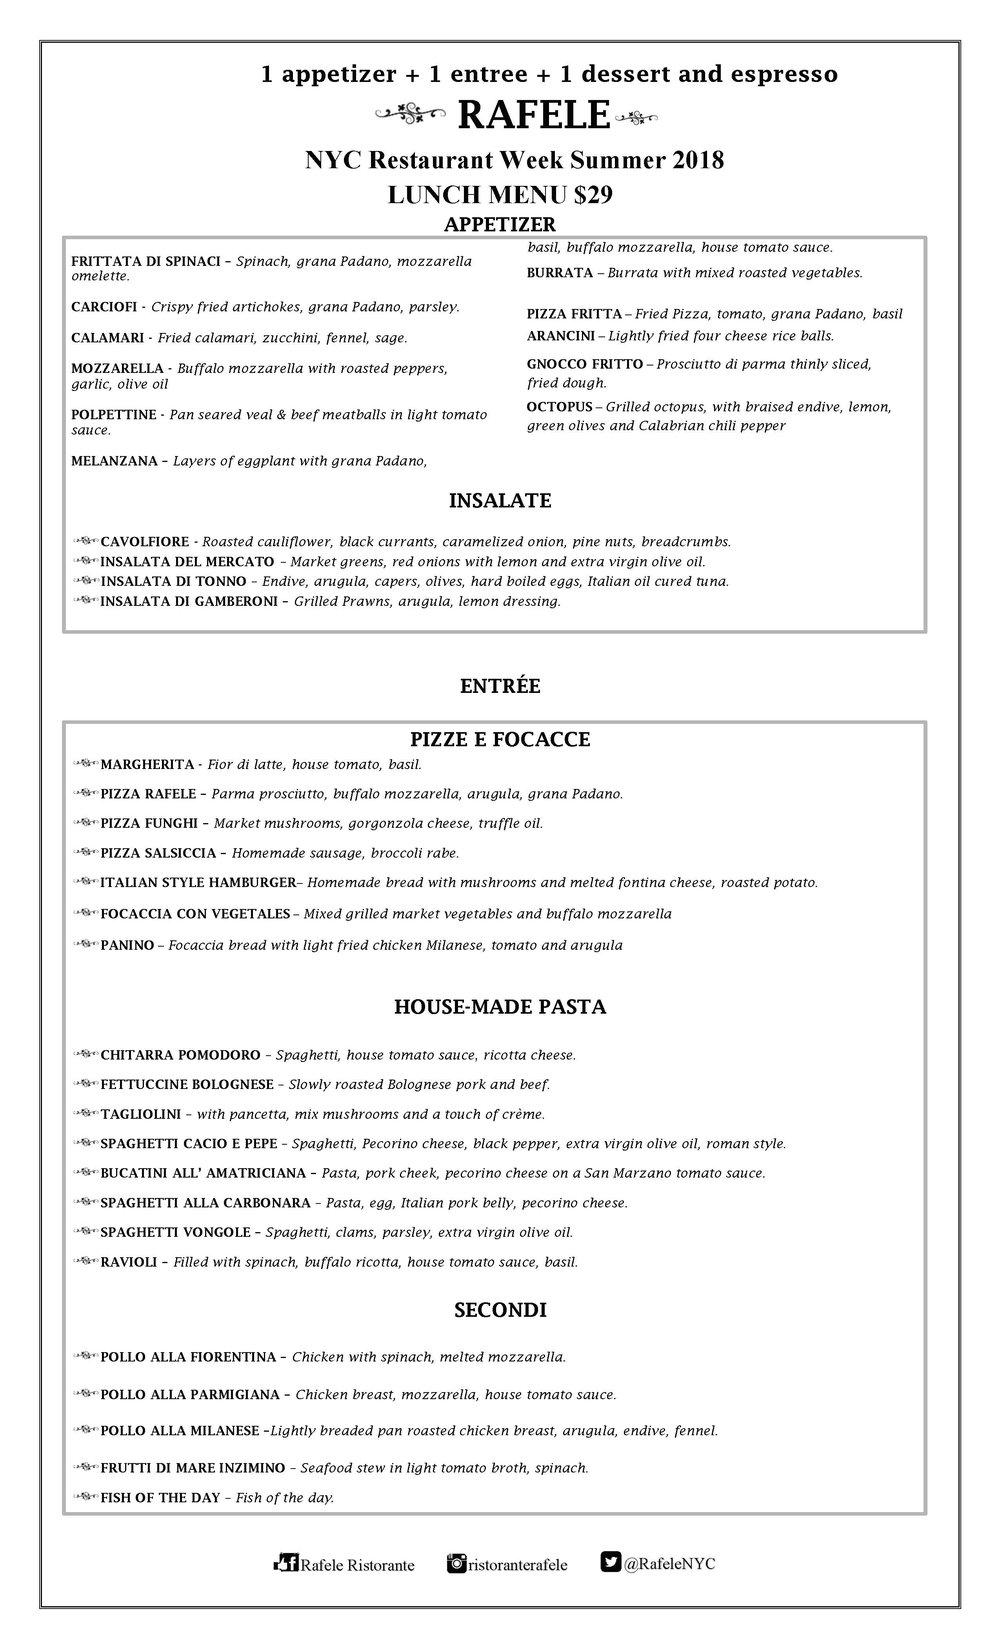 Lunch NYC Restaurant Week.jpg